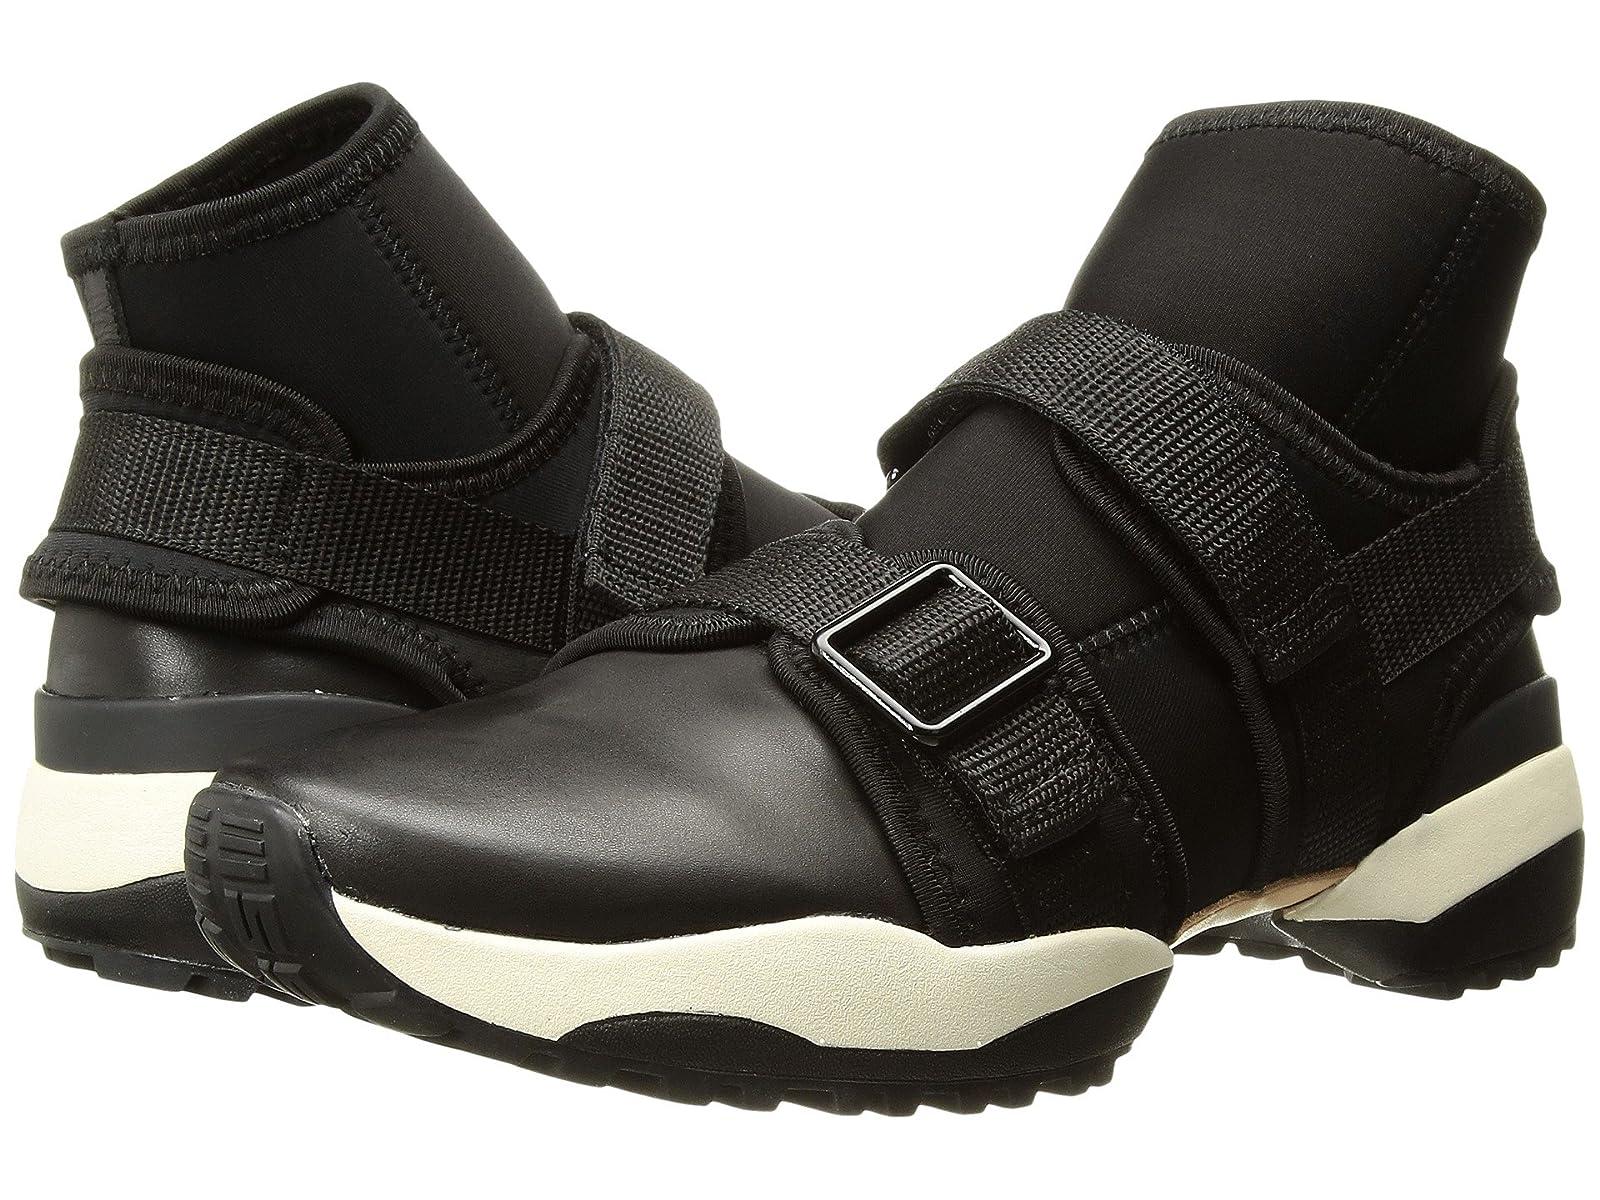 Y's by Yohji Yamamoto Neo Plain SneakerCheap and distinctive eye-catching shoes